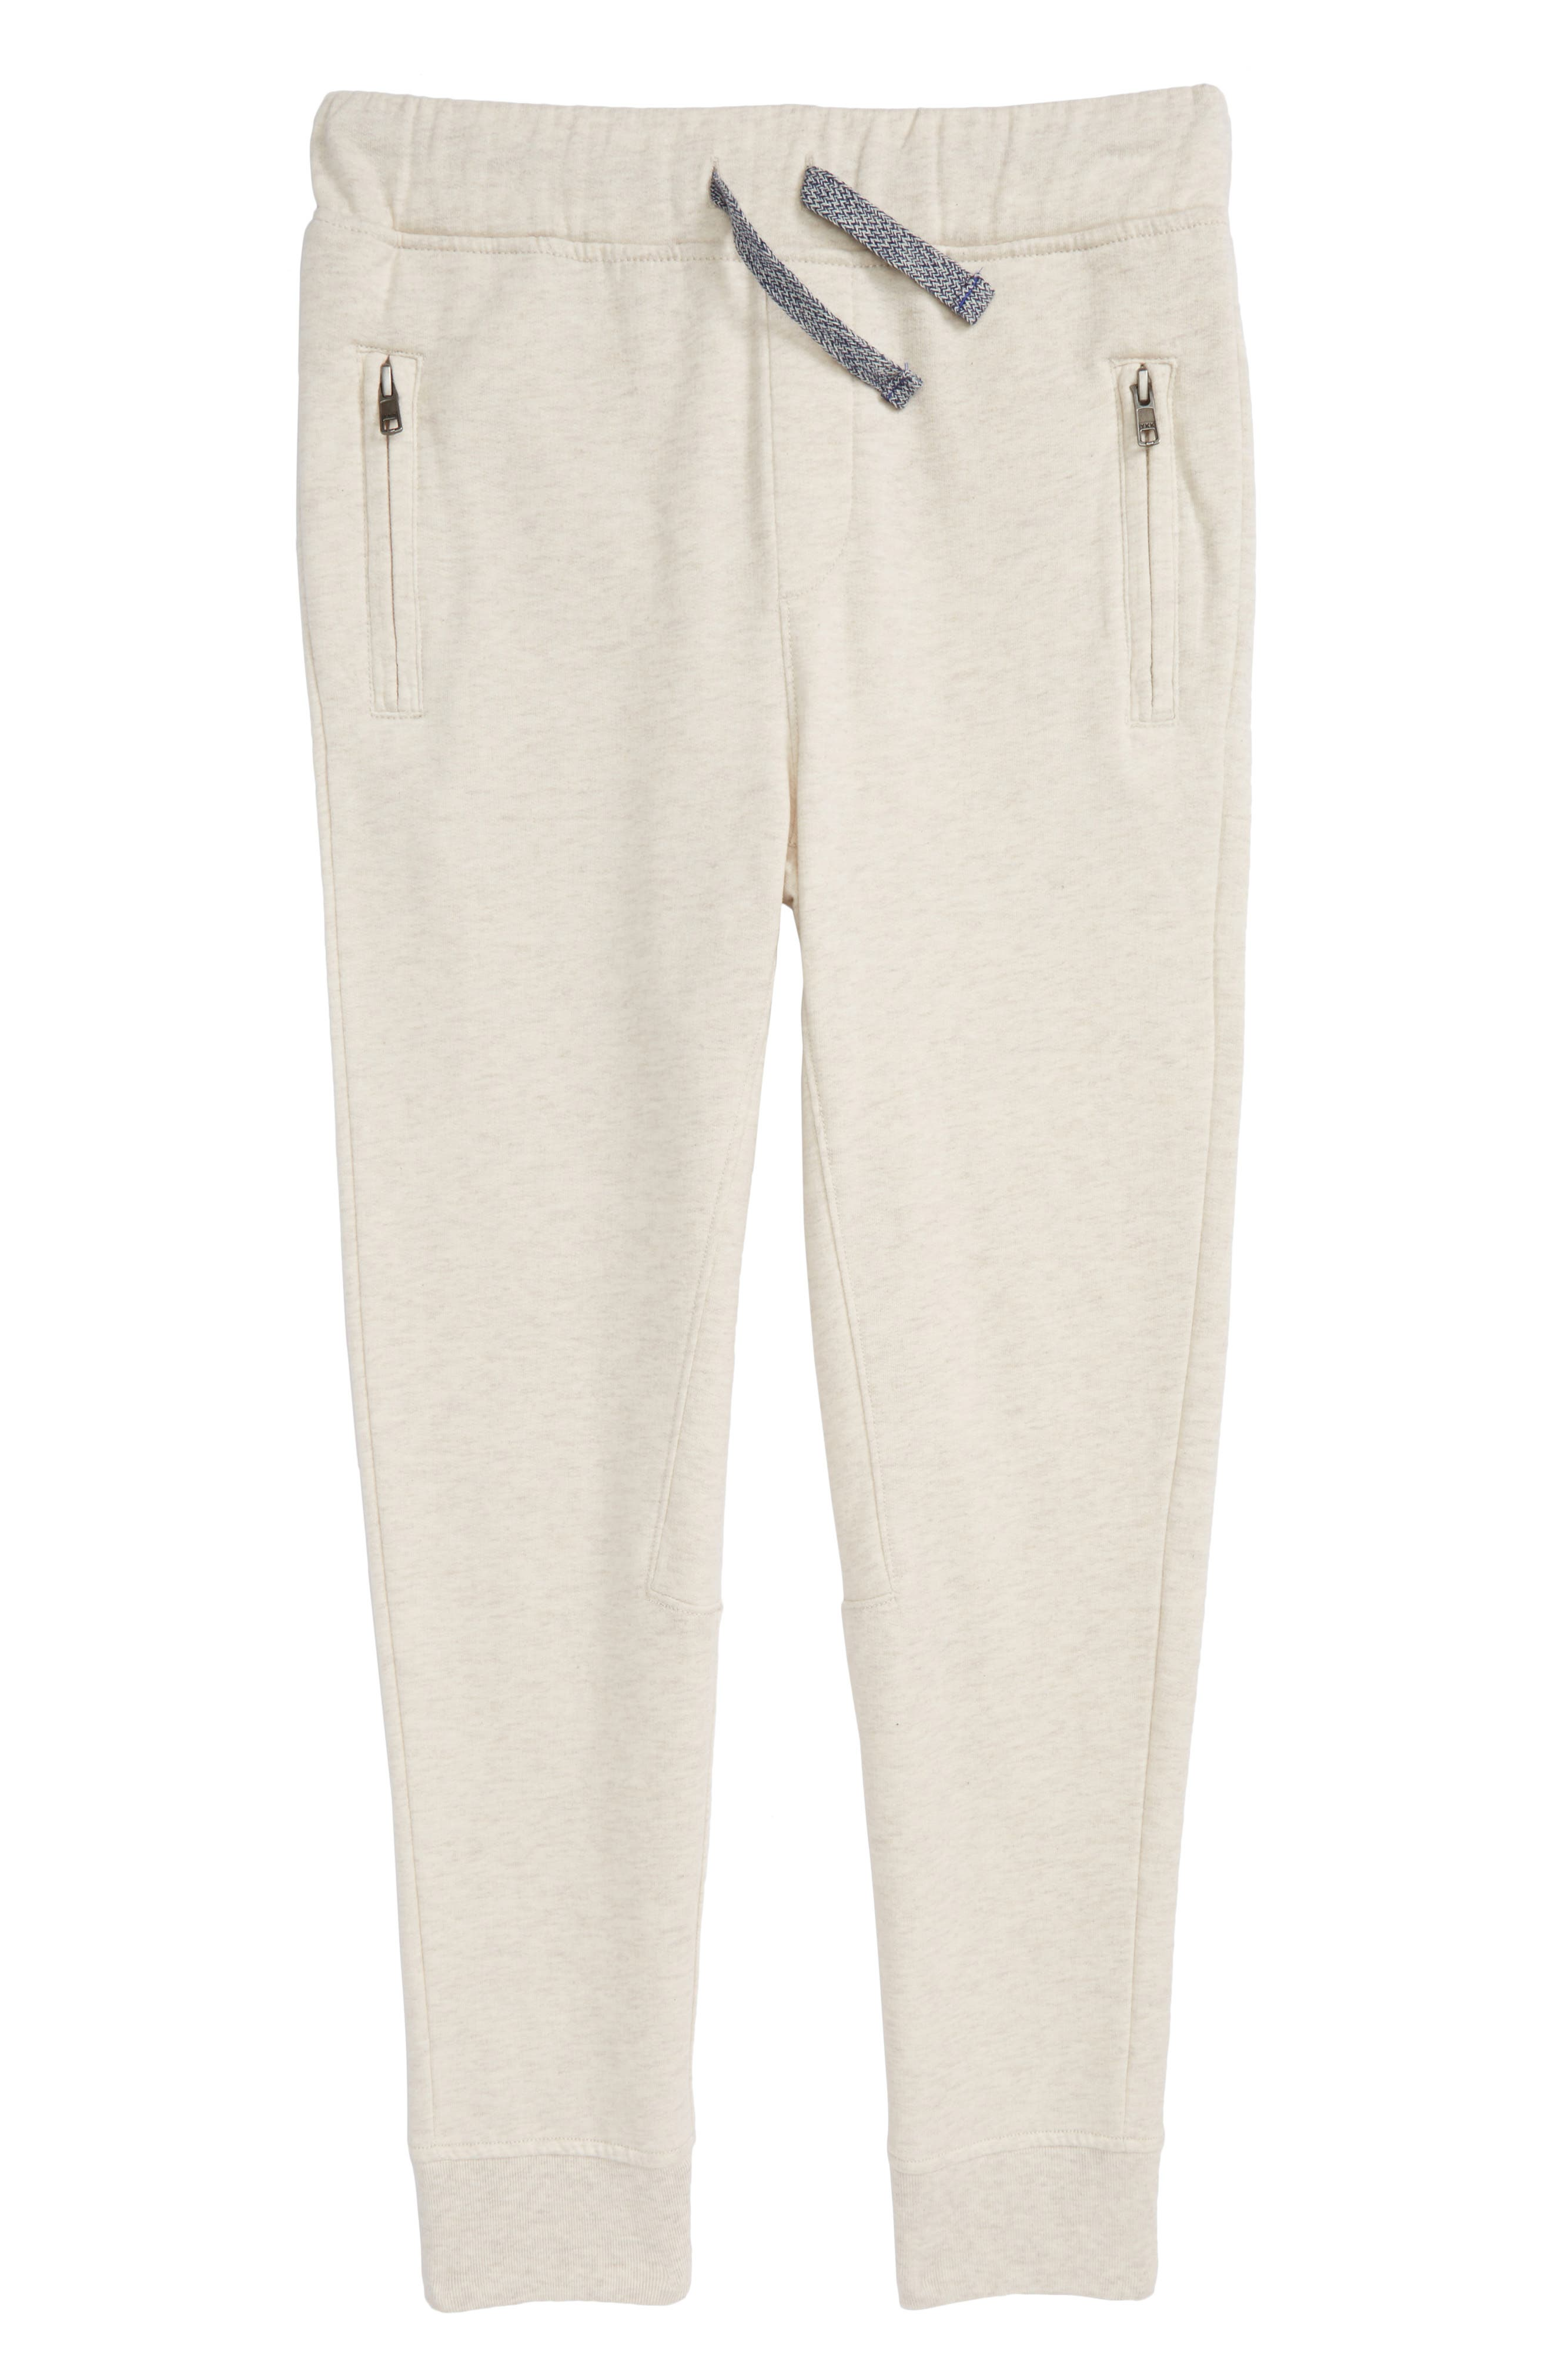 Slim Jogger Pants,                         Main,                         color, Heather Oatmeal